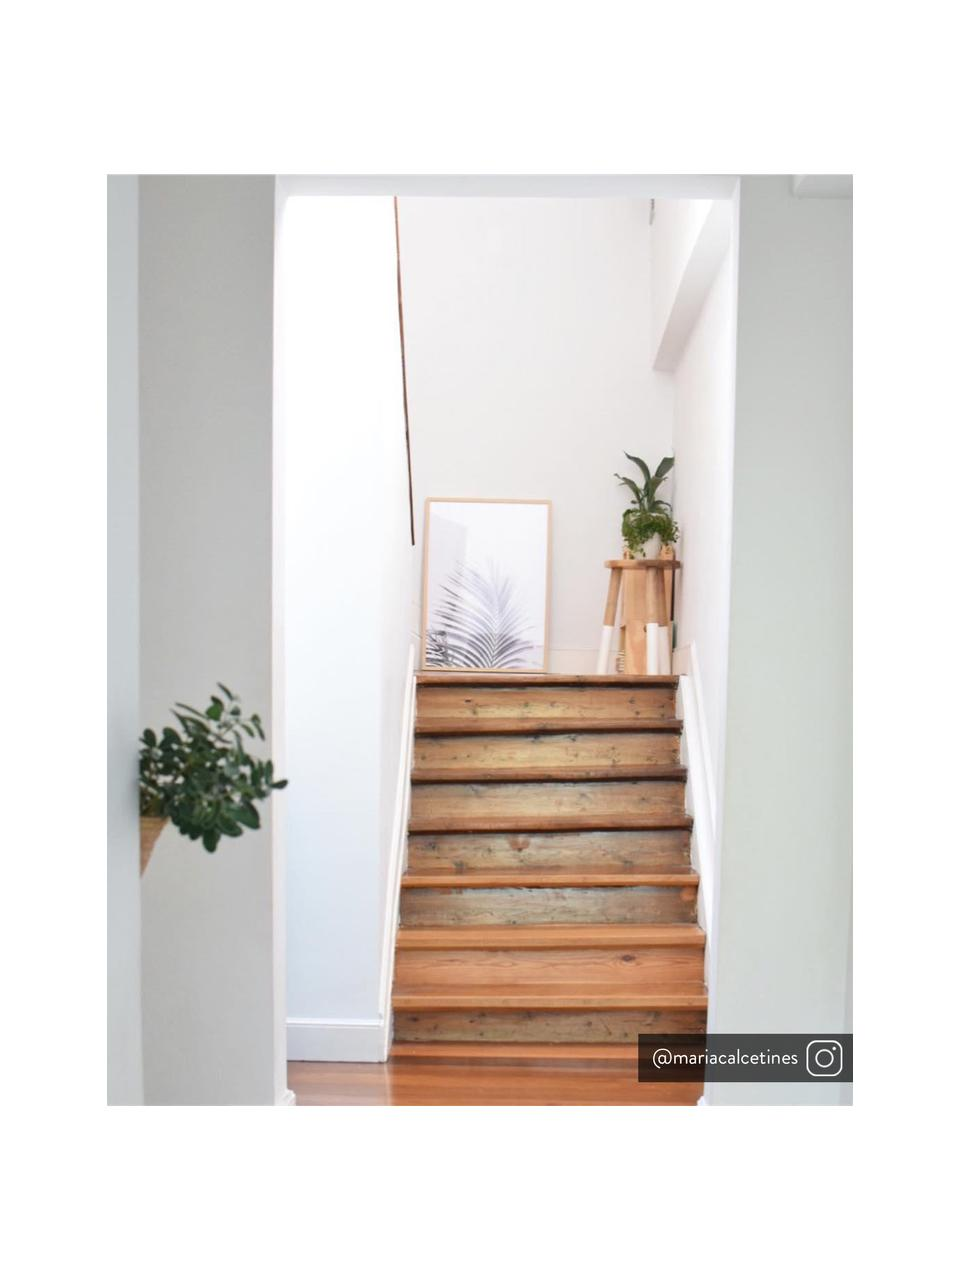 Sgabello scandi in legno Brocsy, Legno Mungur, bianco, Legno Mungur, bianco, Larg. 30 x Alt. 44 cm